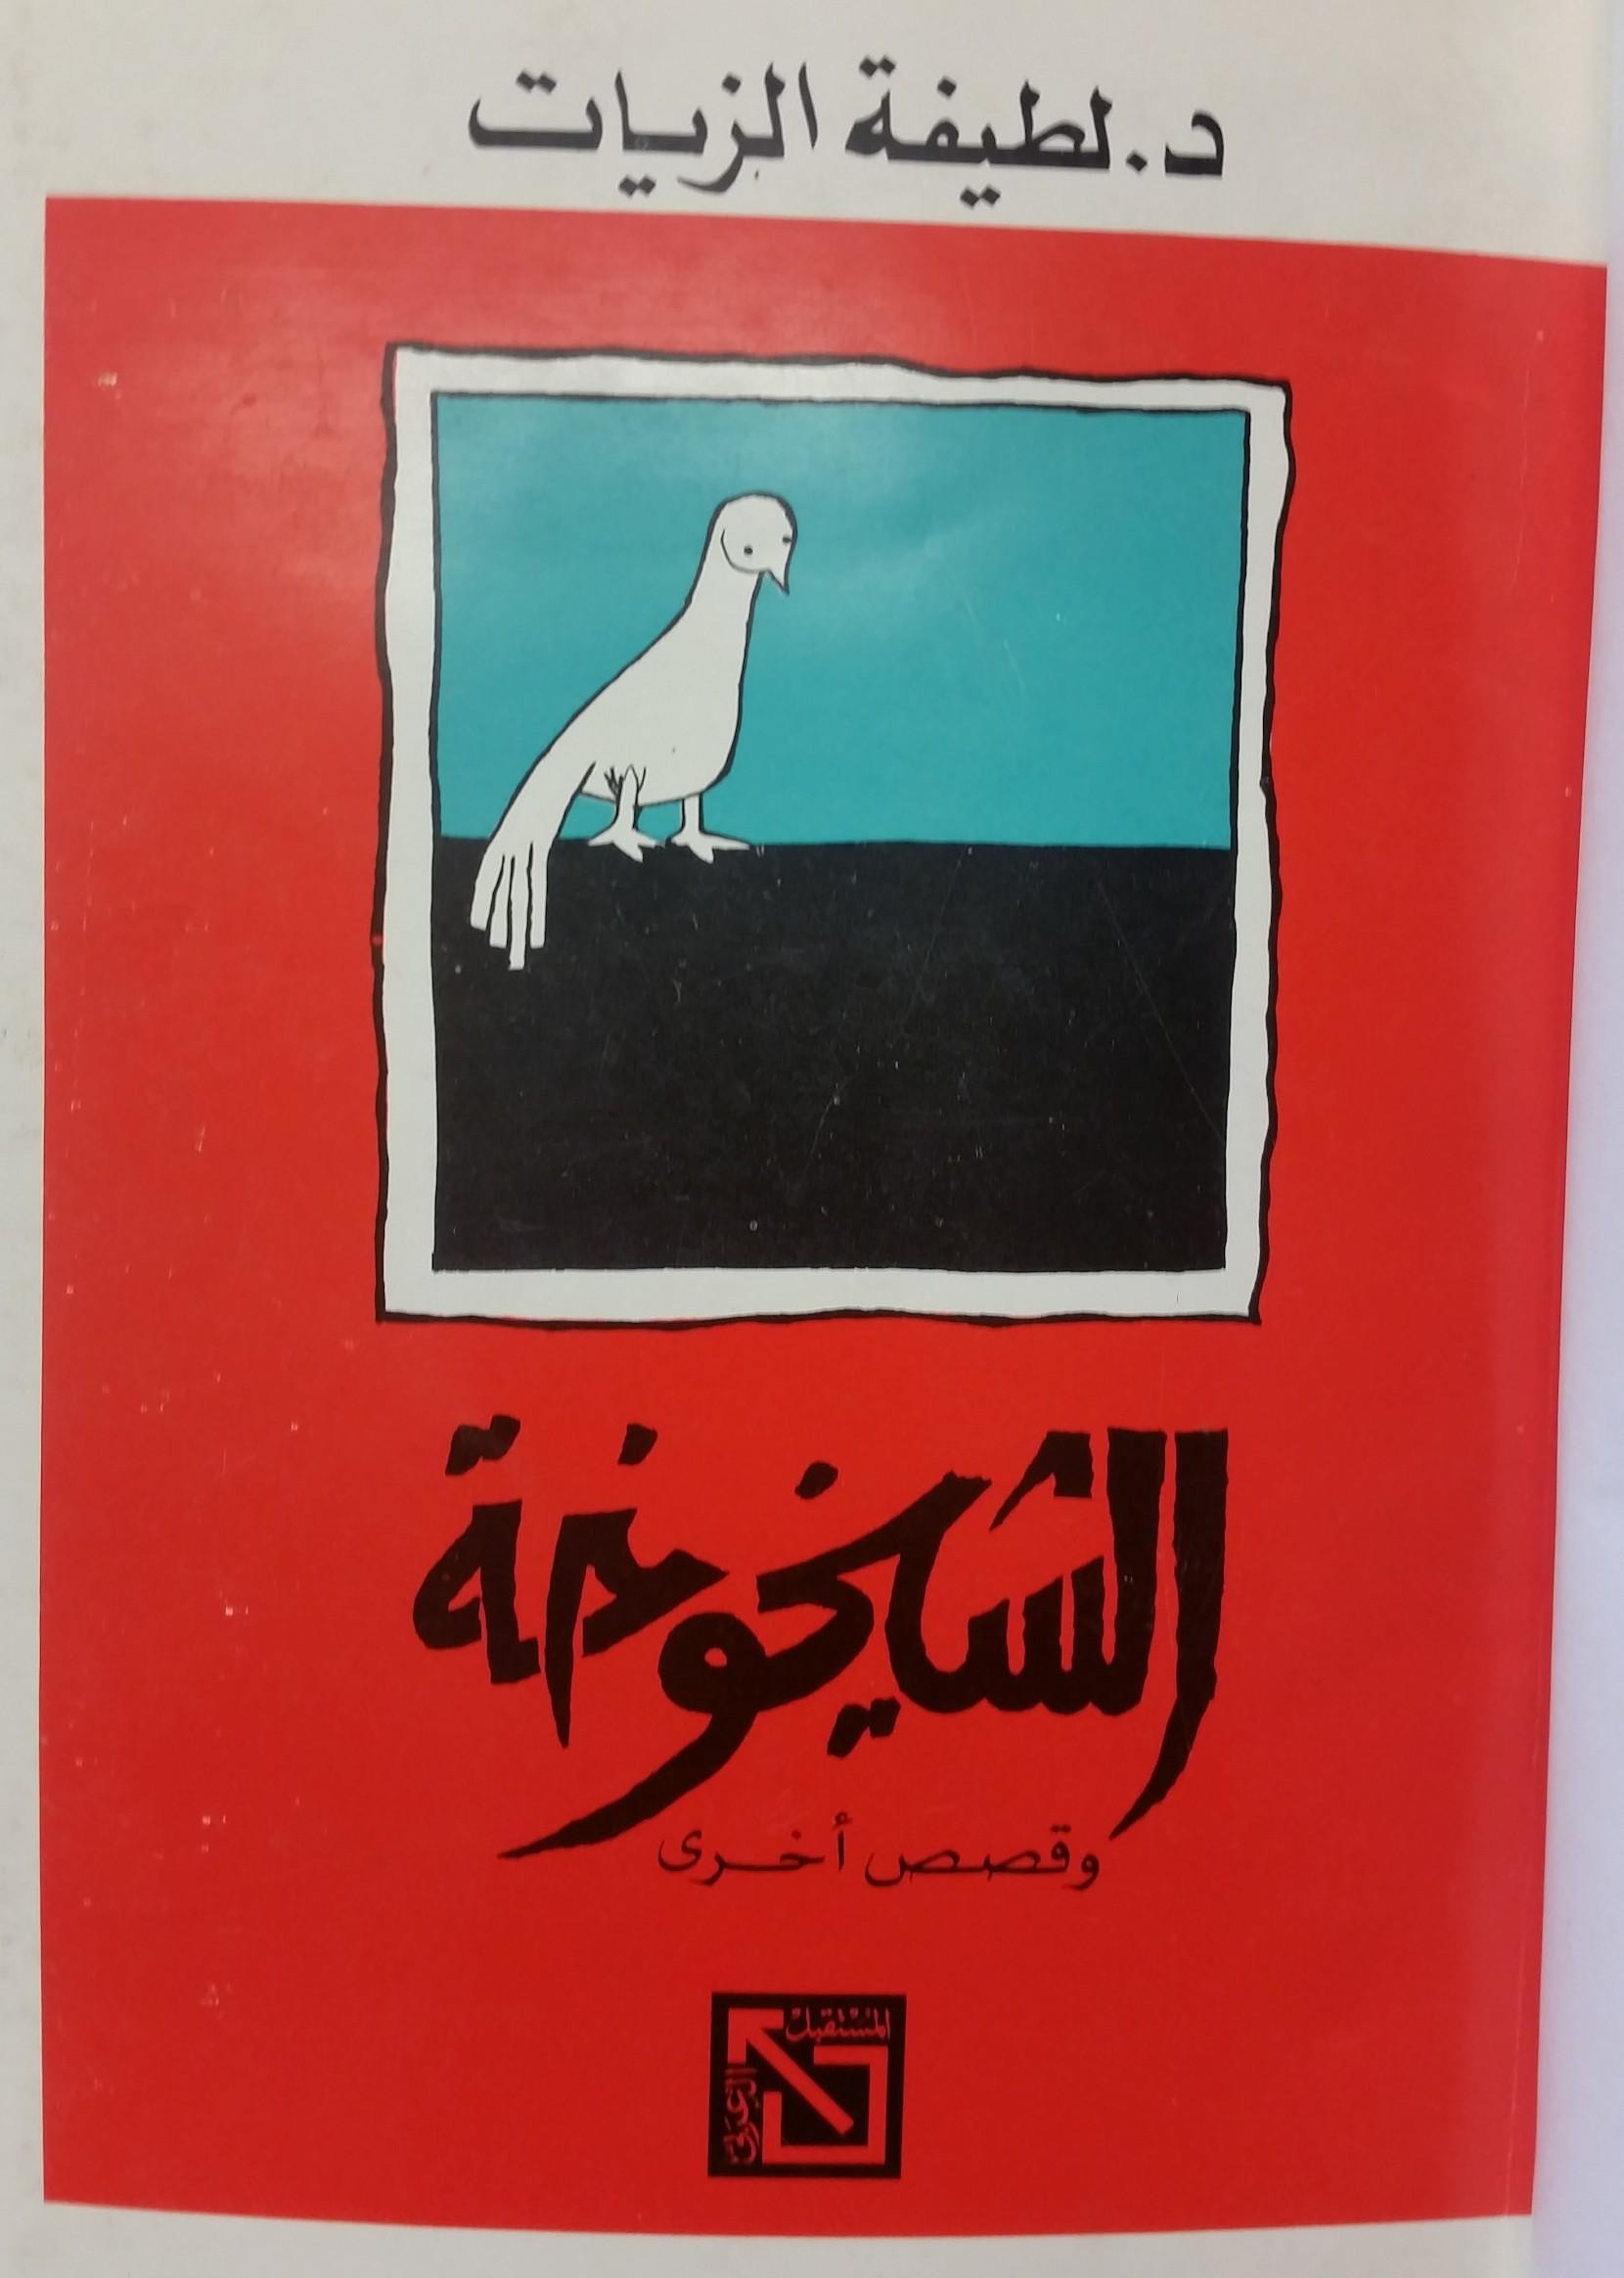 By Laṭīfah al-Zayyāt (al-Qāhirah : Dār al-Mustaqbal al-ʻArabī, 1986